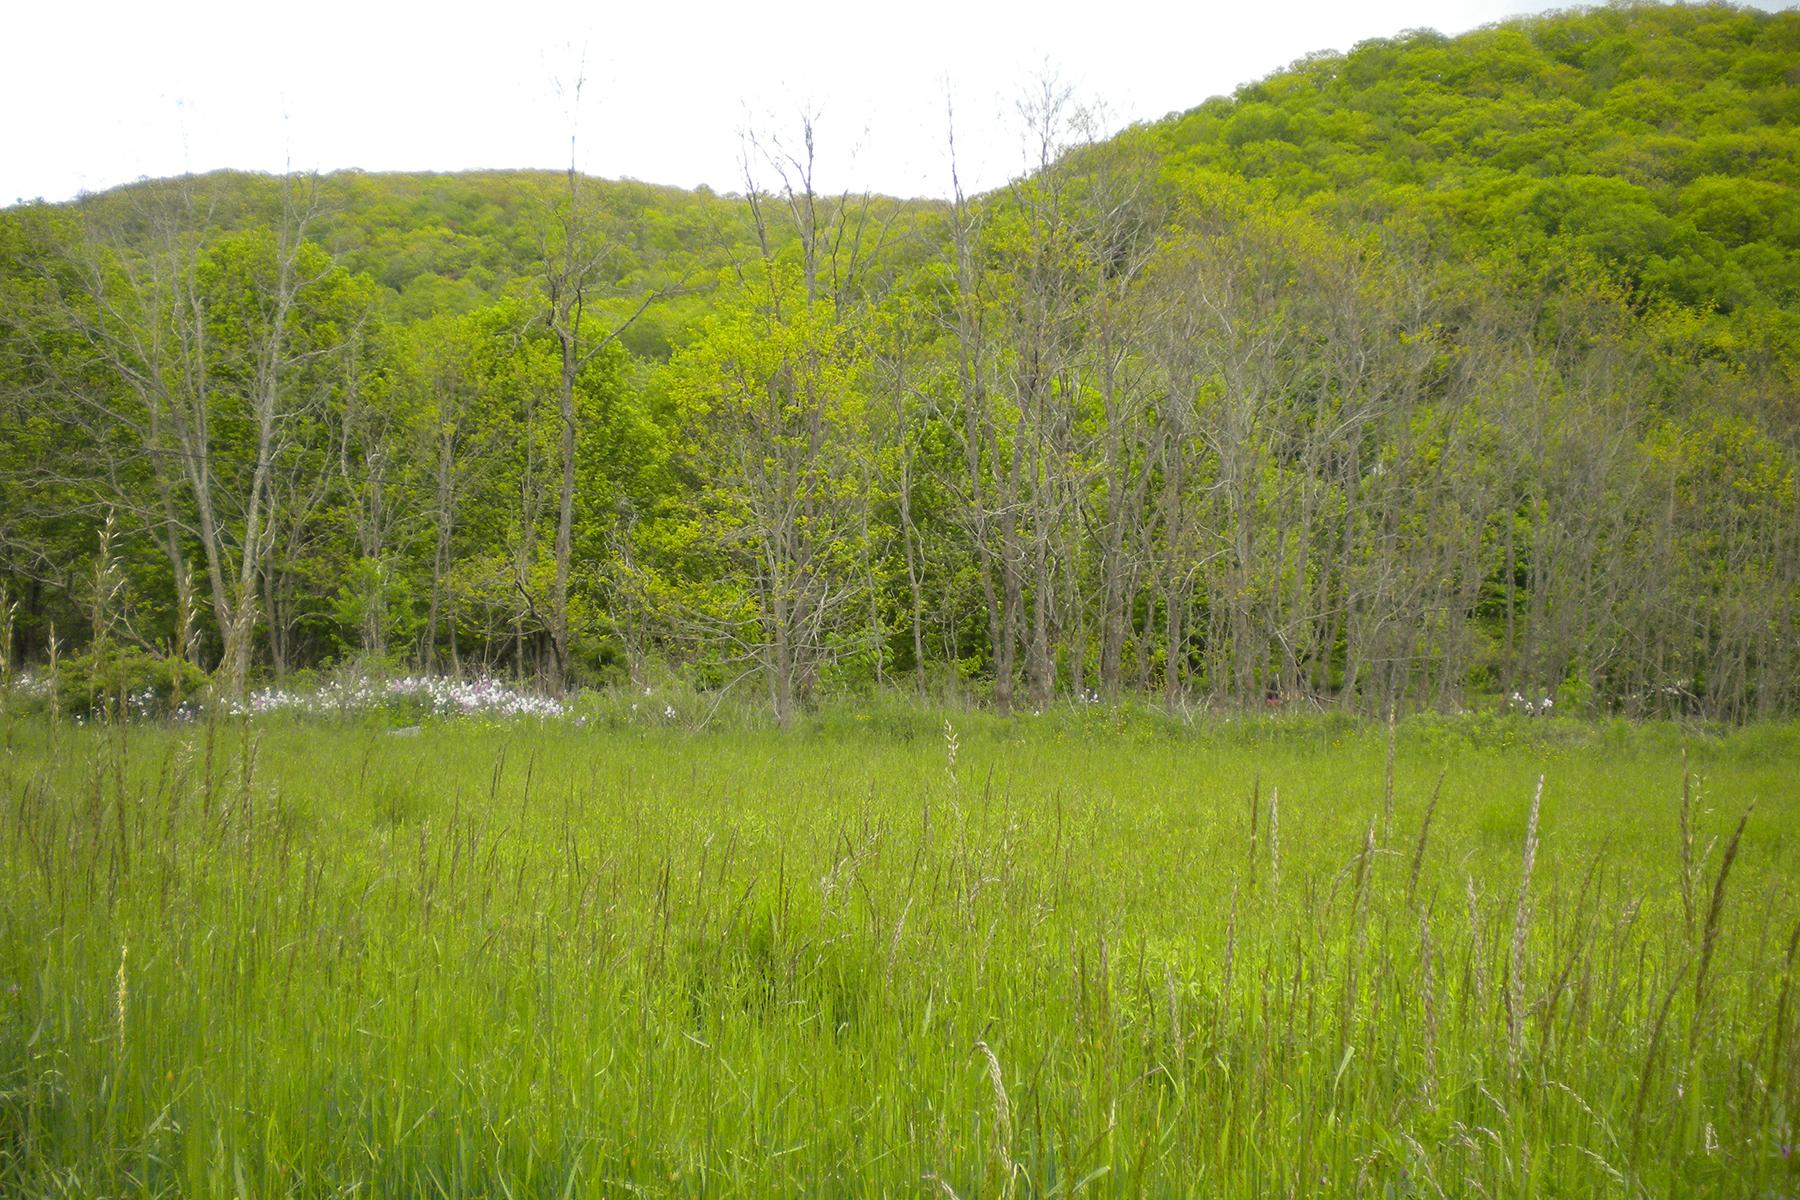 Land for Sale at TBD Balm Highway (sr 194), Banner Elk, NC 28604 TBD Balm Highway (sr 194), Banner Elk, North Carolina 28604 United States